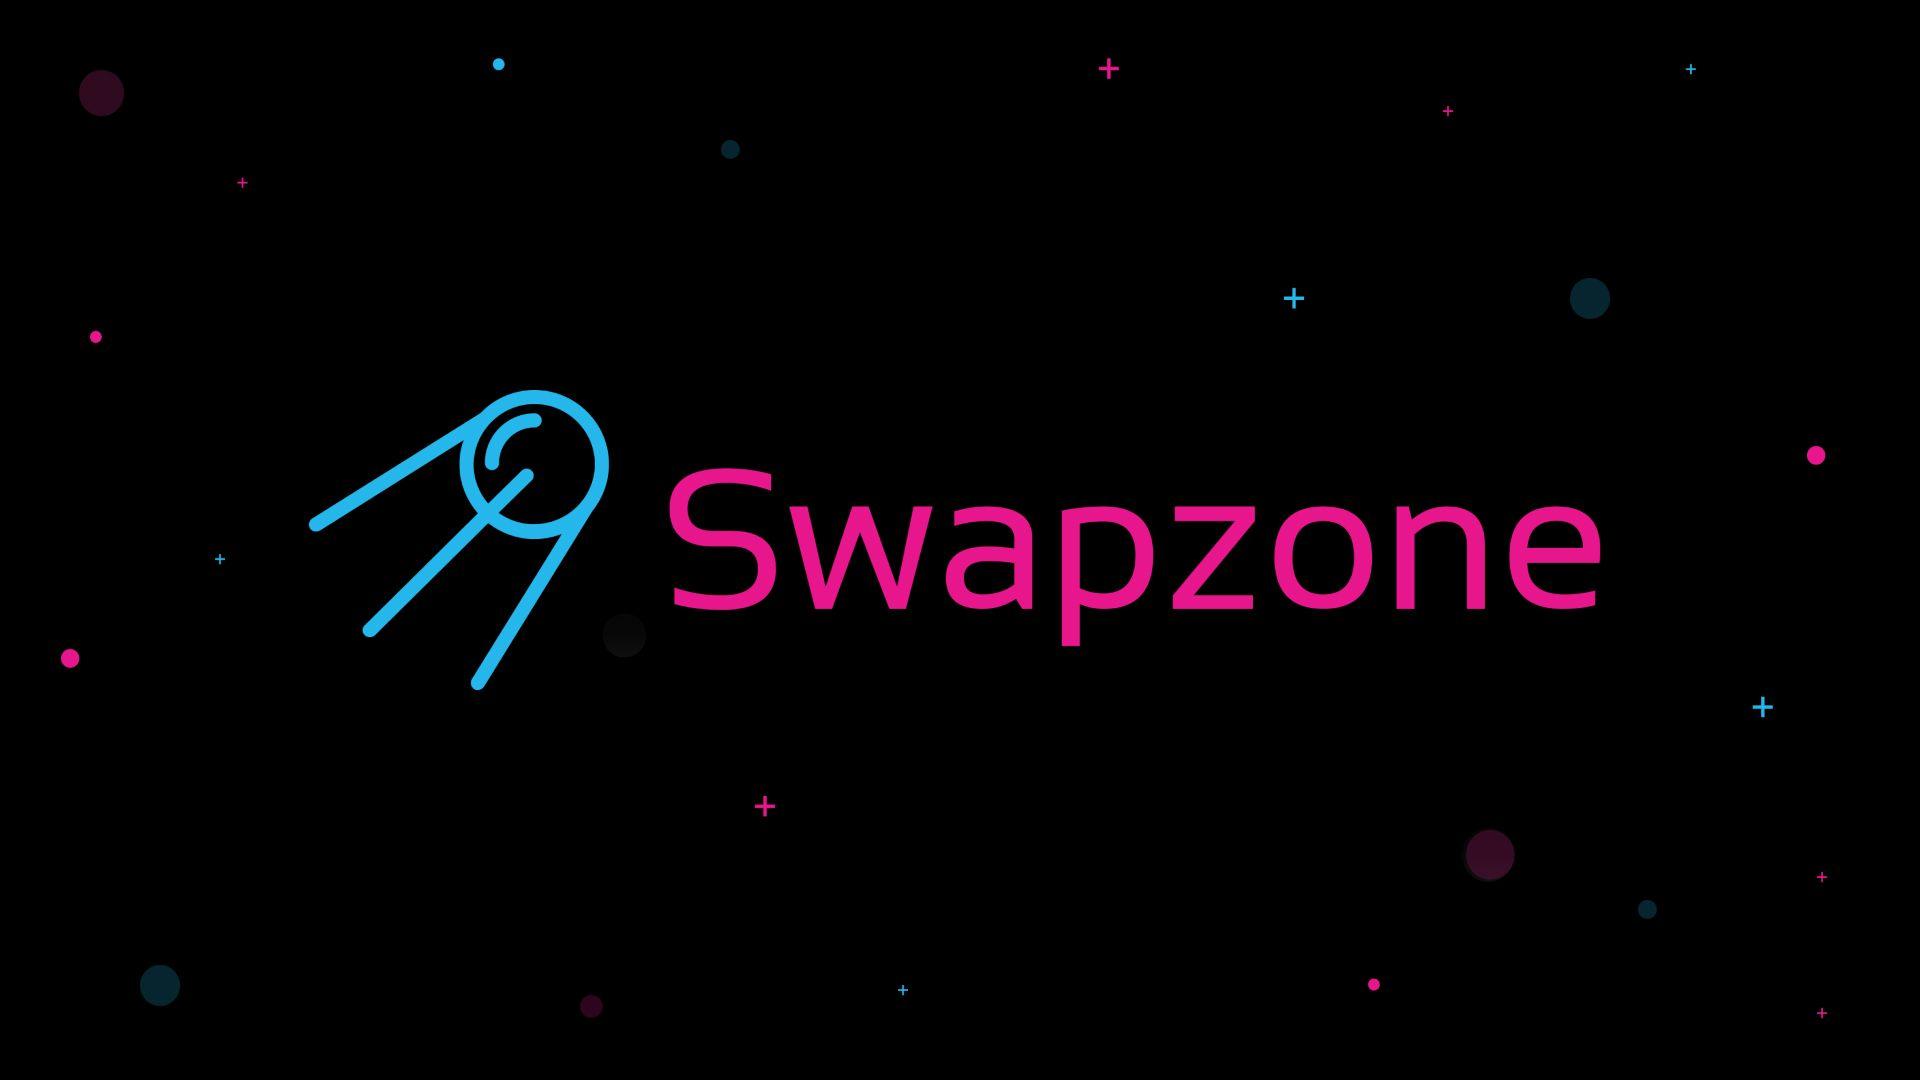 Swapzone